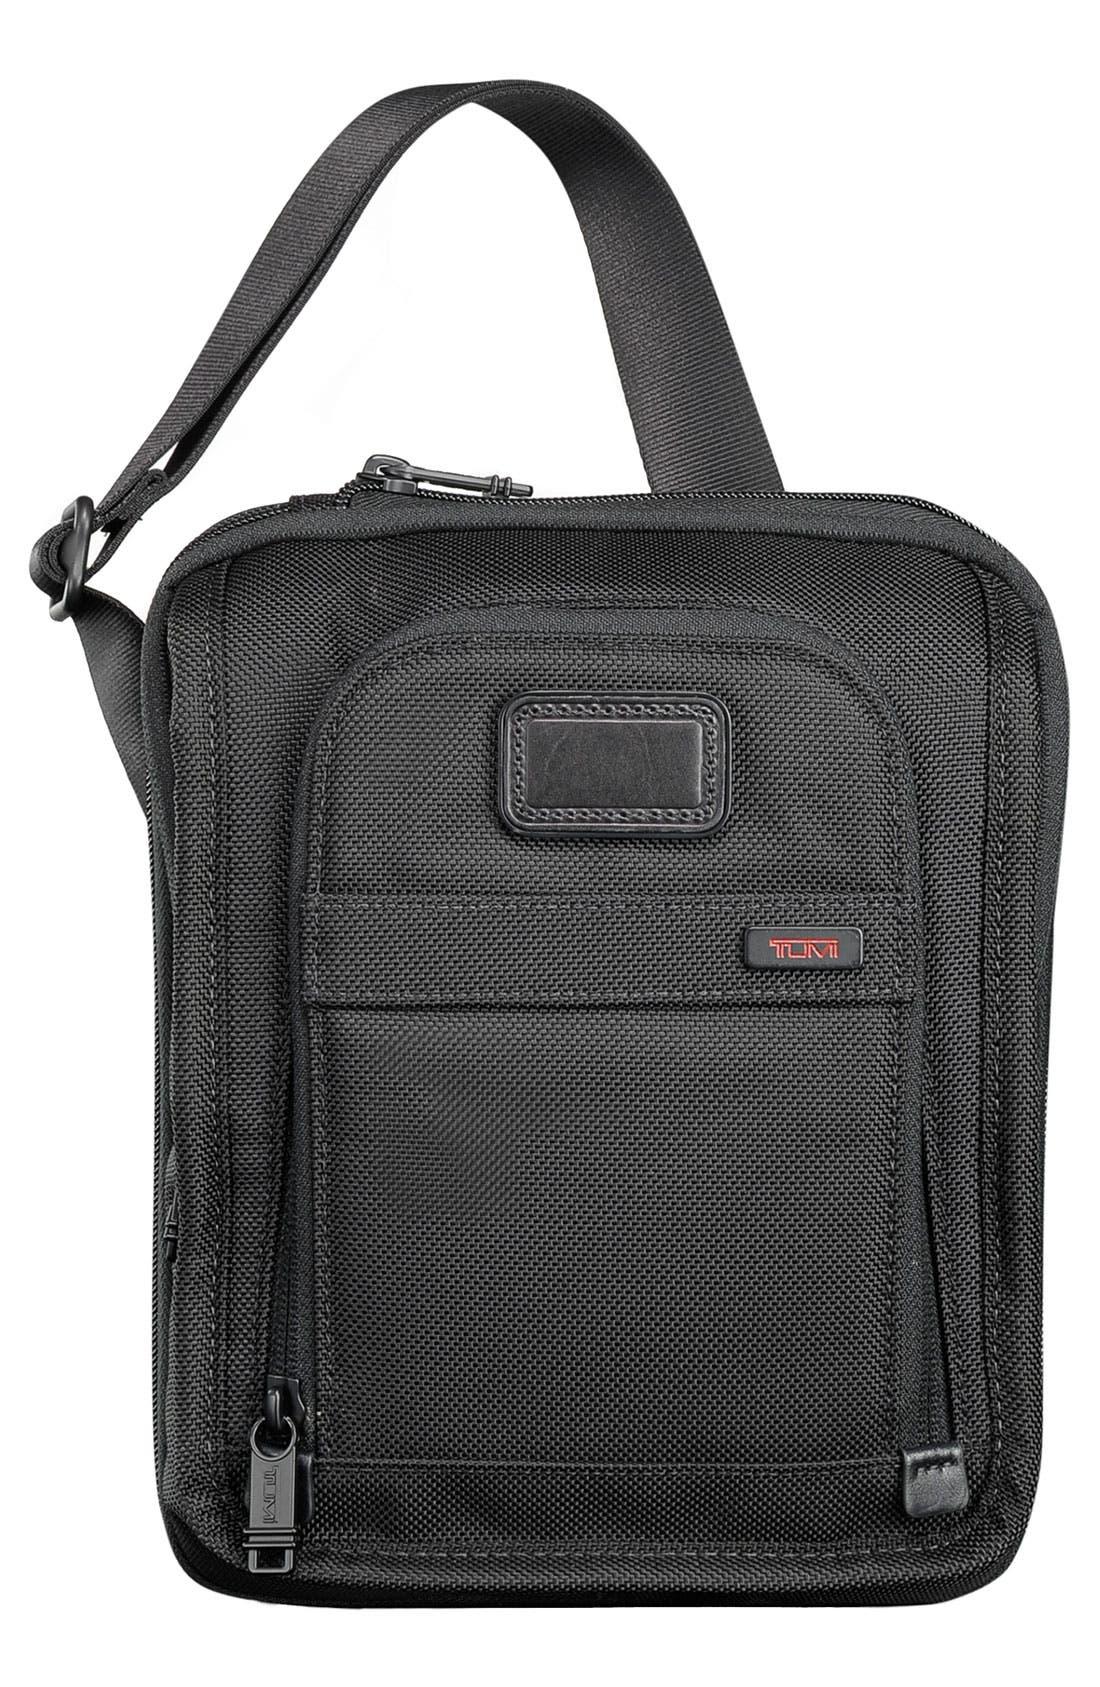 Alternate Image 1 Selected - Tumi 'Alpha' iPad Messsenger Bag